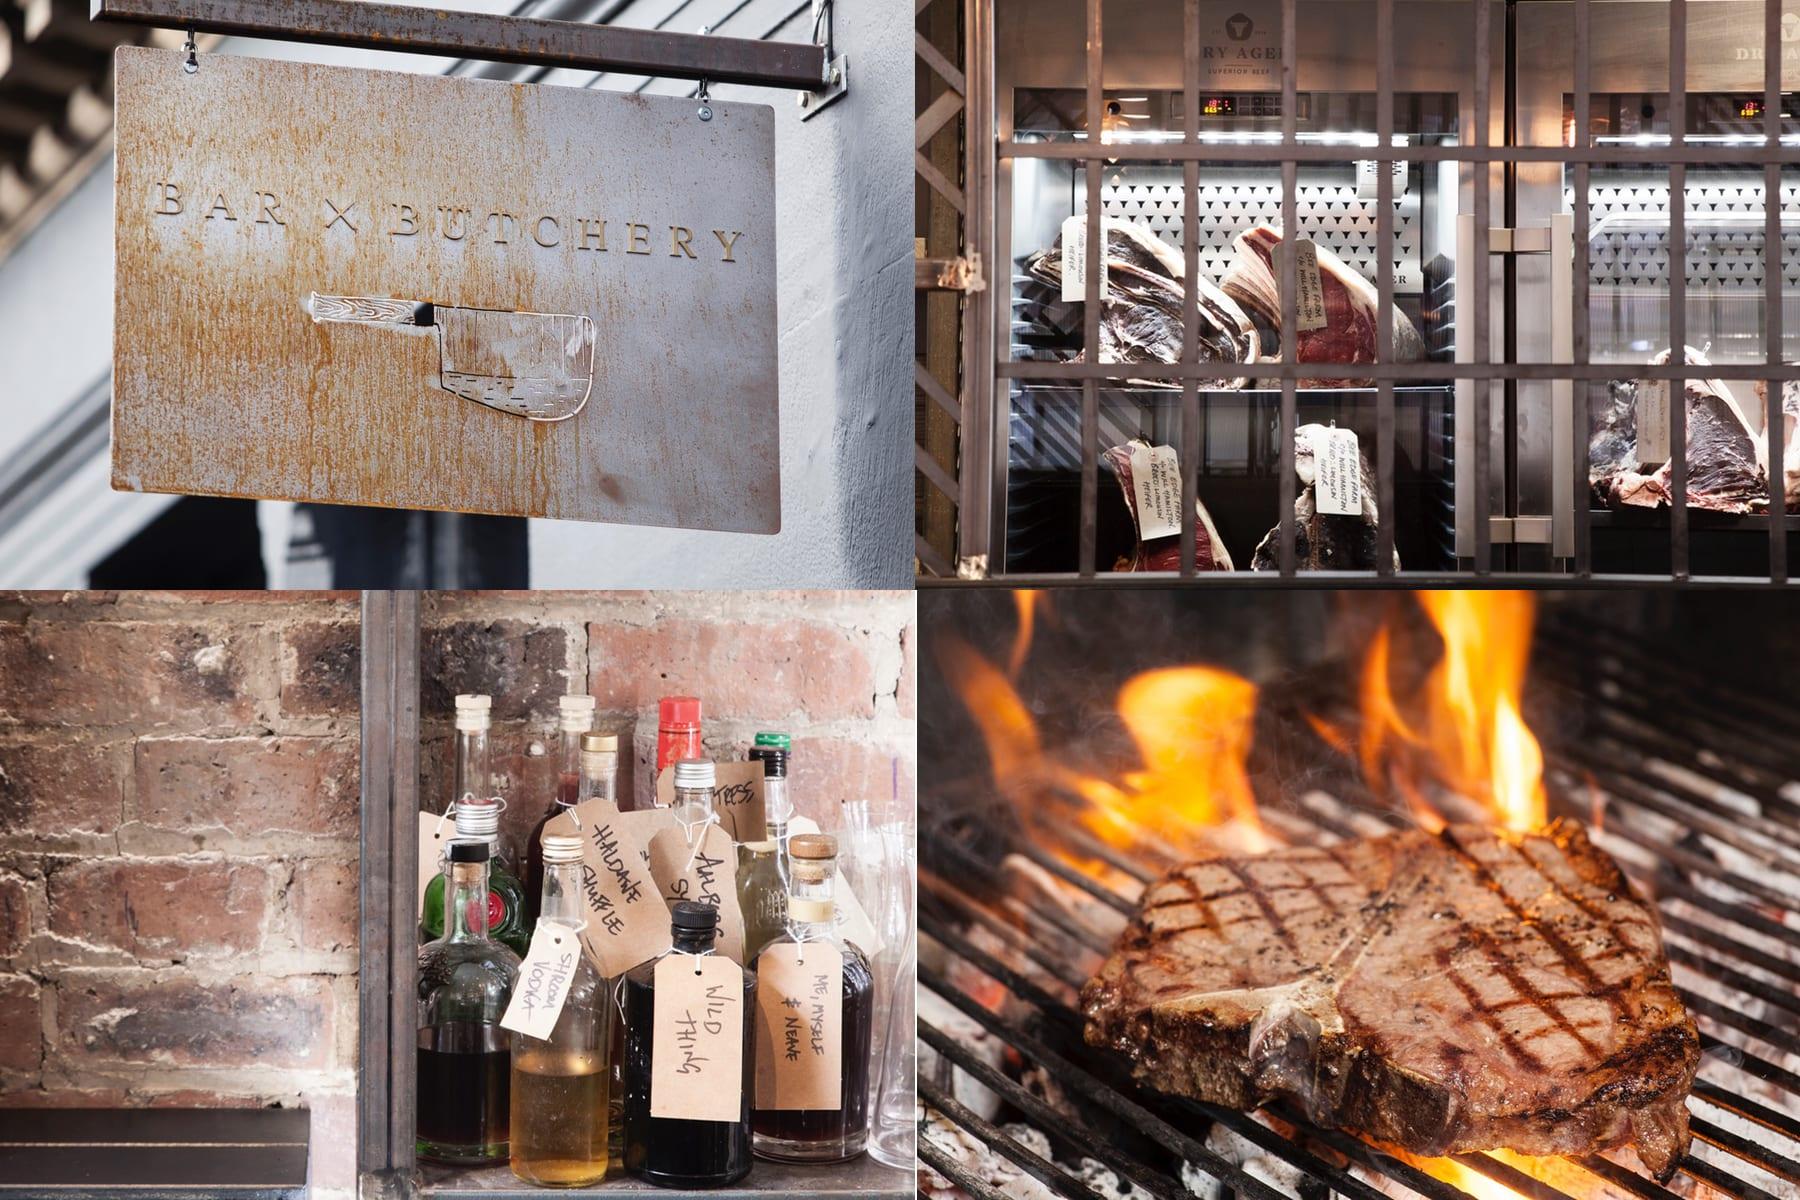 Chop house new Edinburgh Glasgow foodie explorers